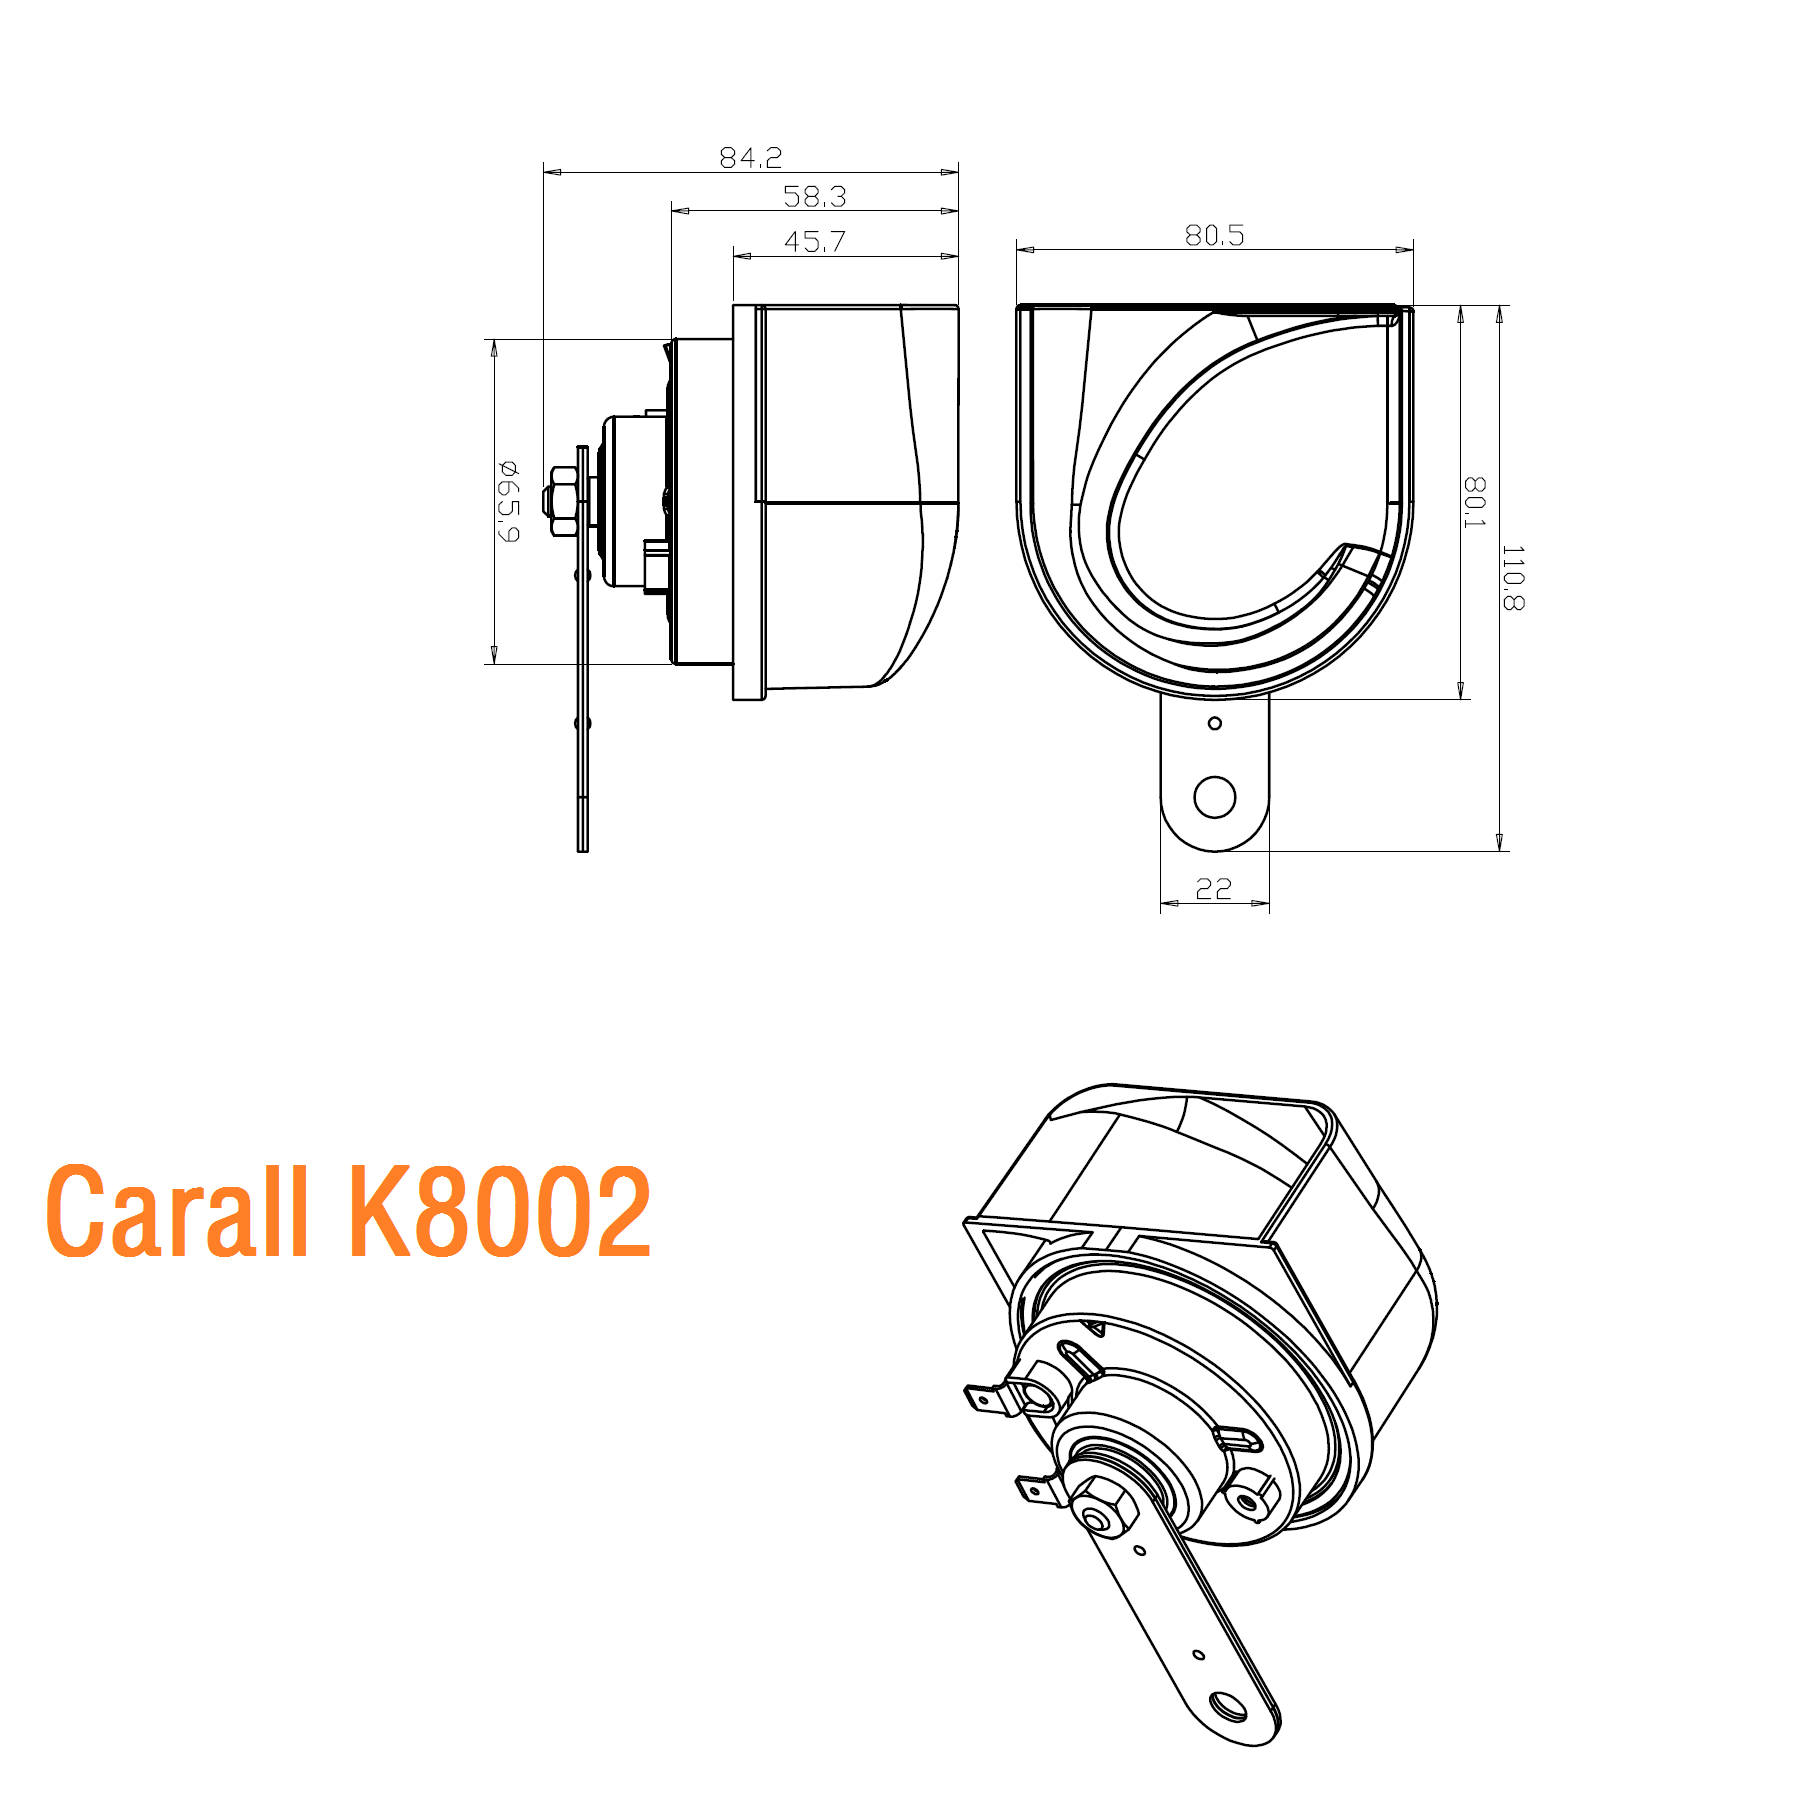 Carall K8002 Automechanika Twin Pack Magic Voice Emark Autoteile Autolautsprecher Auto Snail Horn